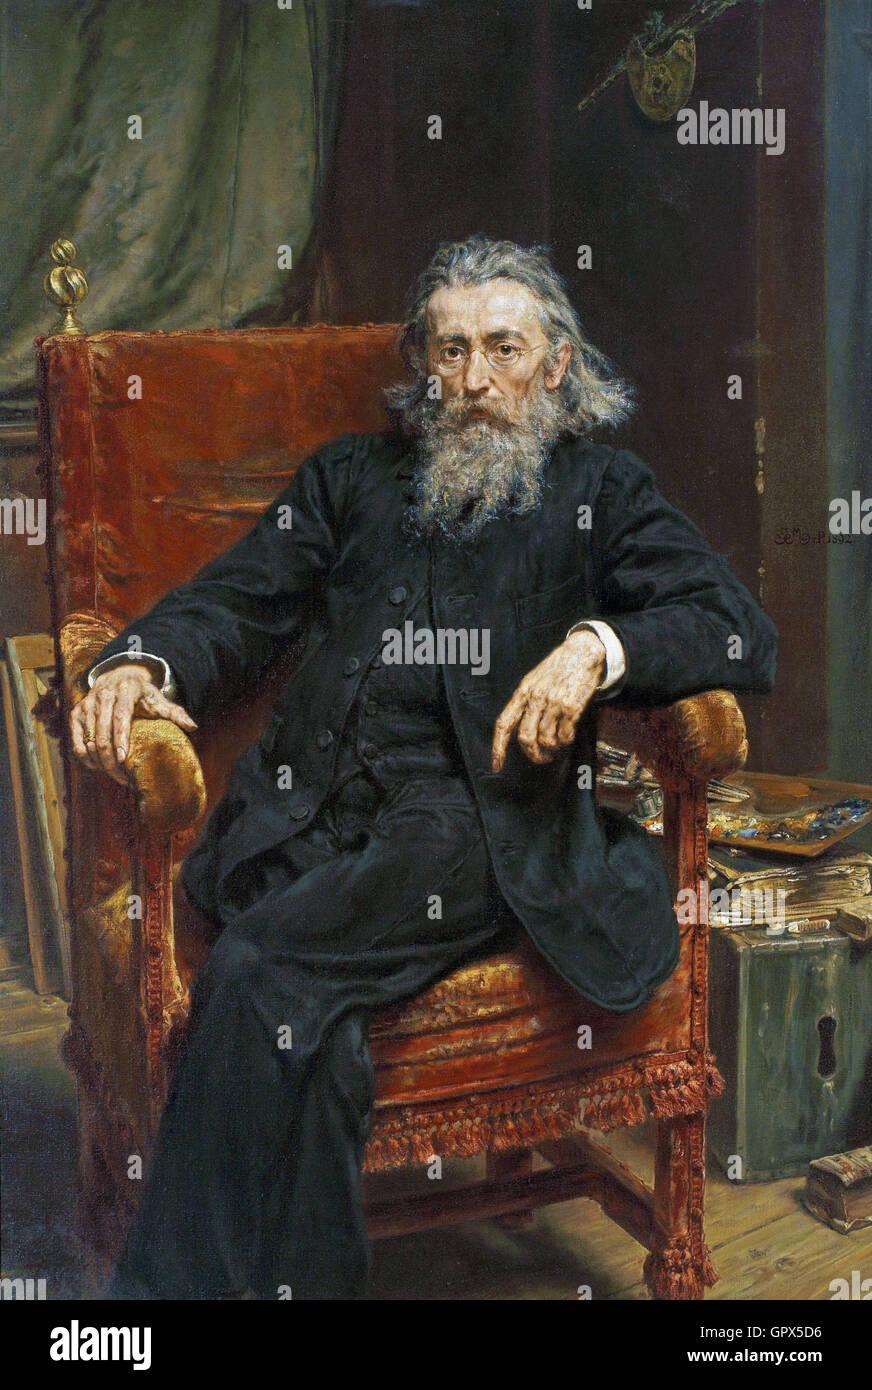 Jan Matejko Self-portrait - Stock Image